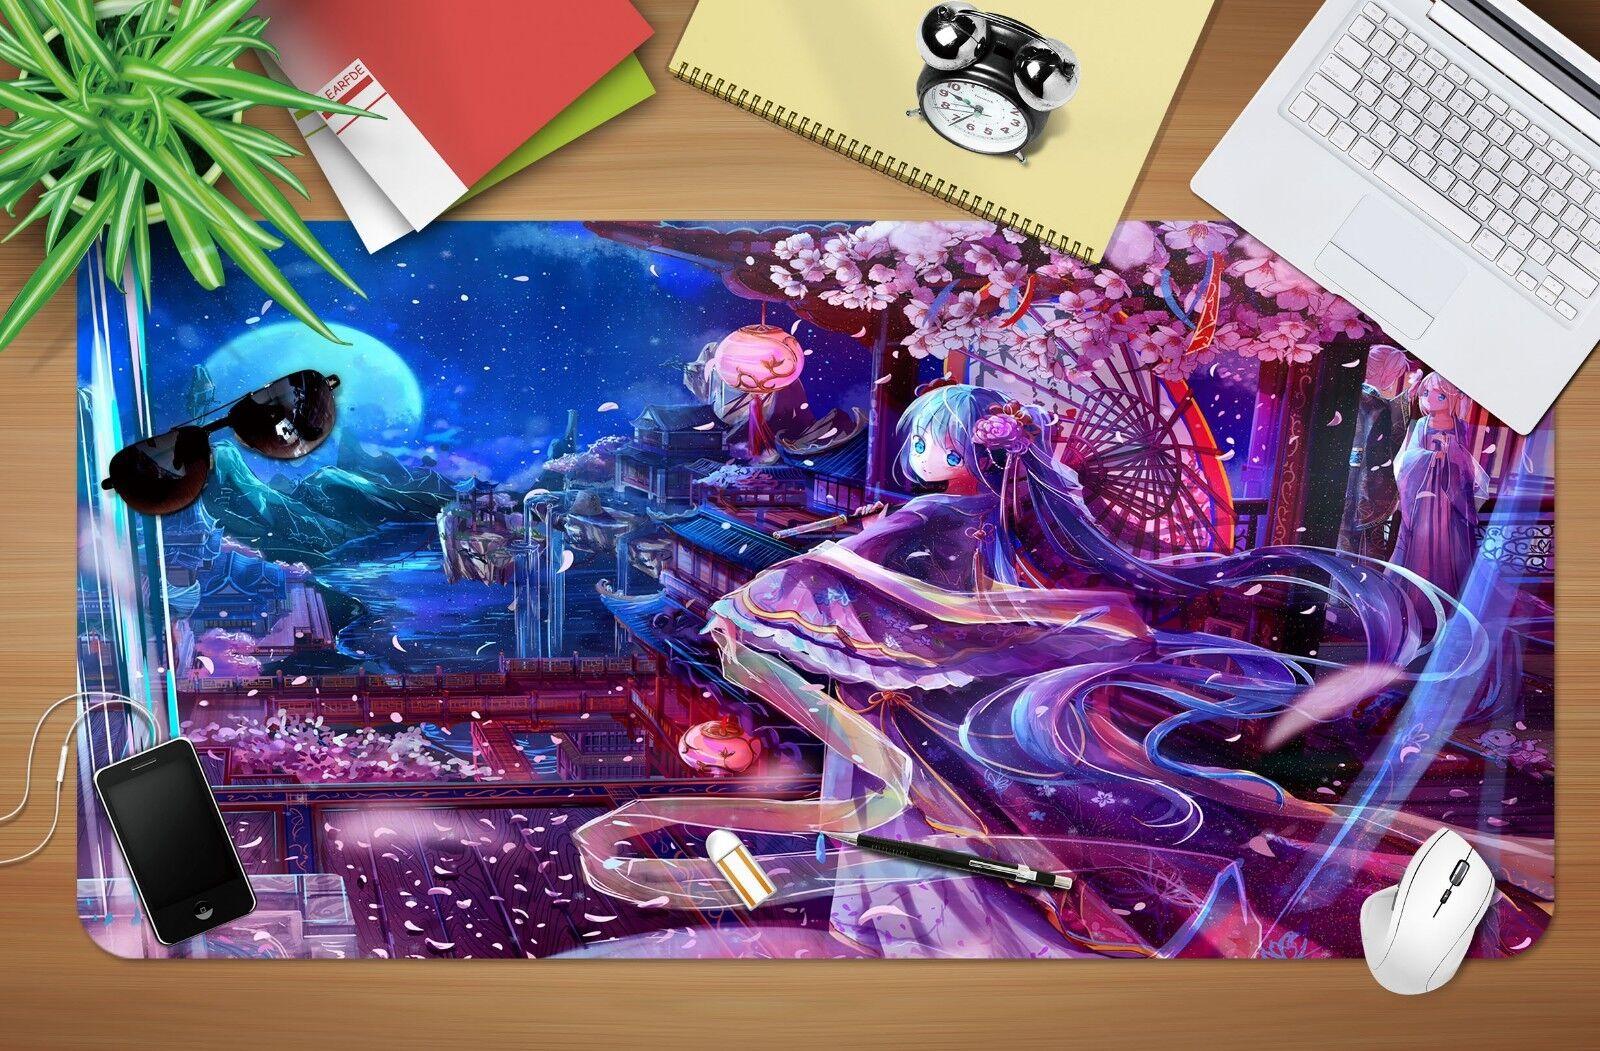 3D Hatsune Miku Virtual 7 Japan Anime Rutschfest Büro Schreibtisch Matte Spiel